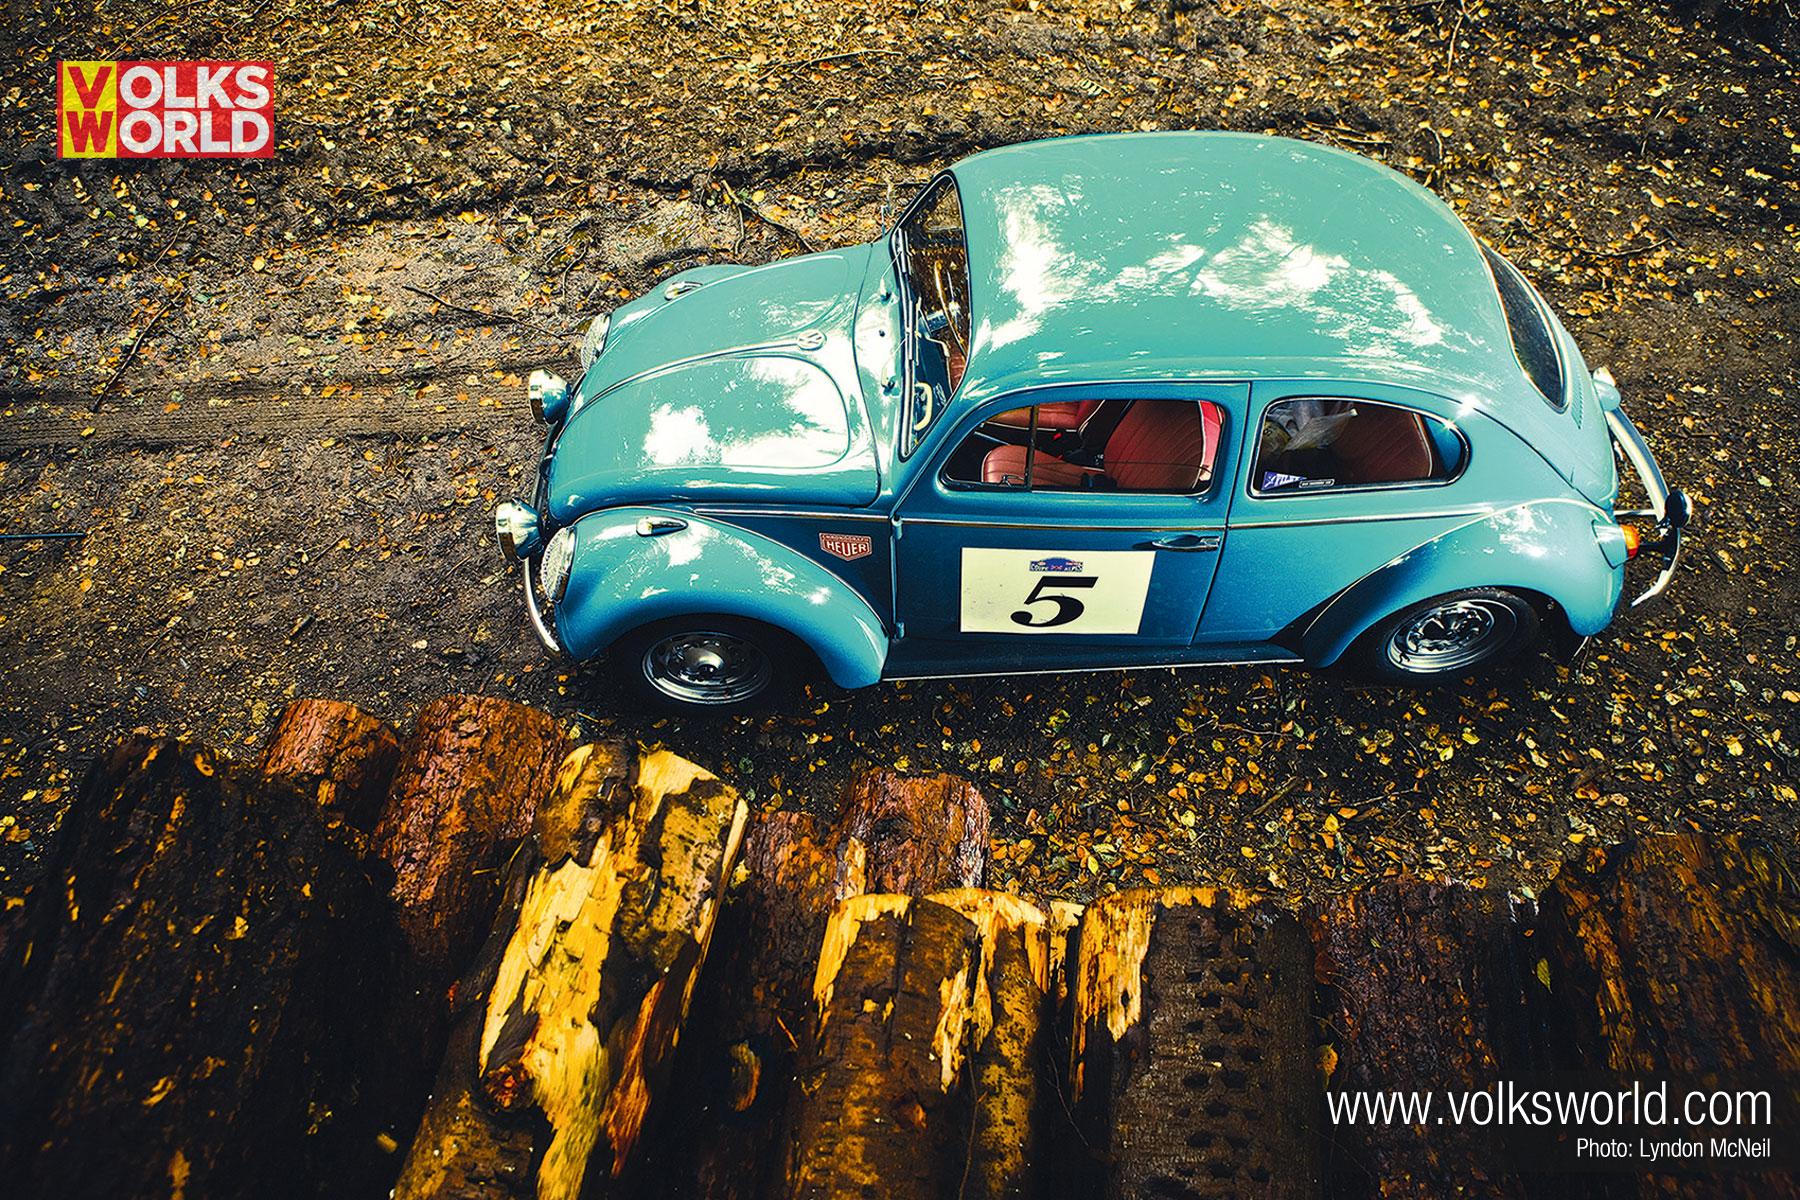 Vw Desktop Wallpaper Volksworld The Air Cooled Vw Magazine Desktop 1800x1200